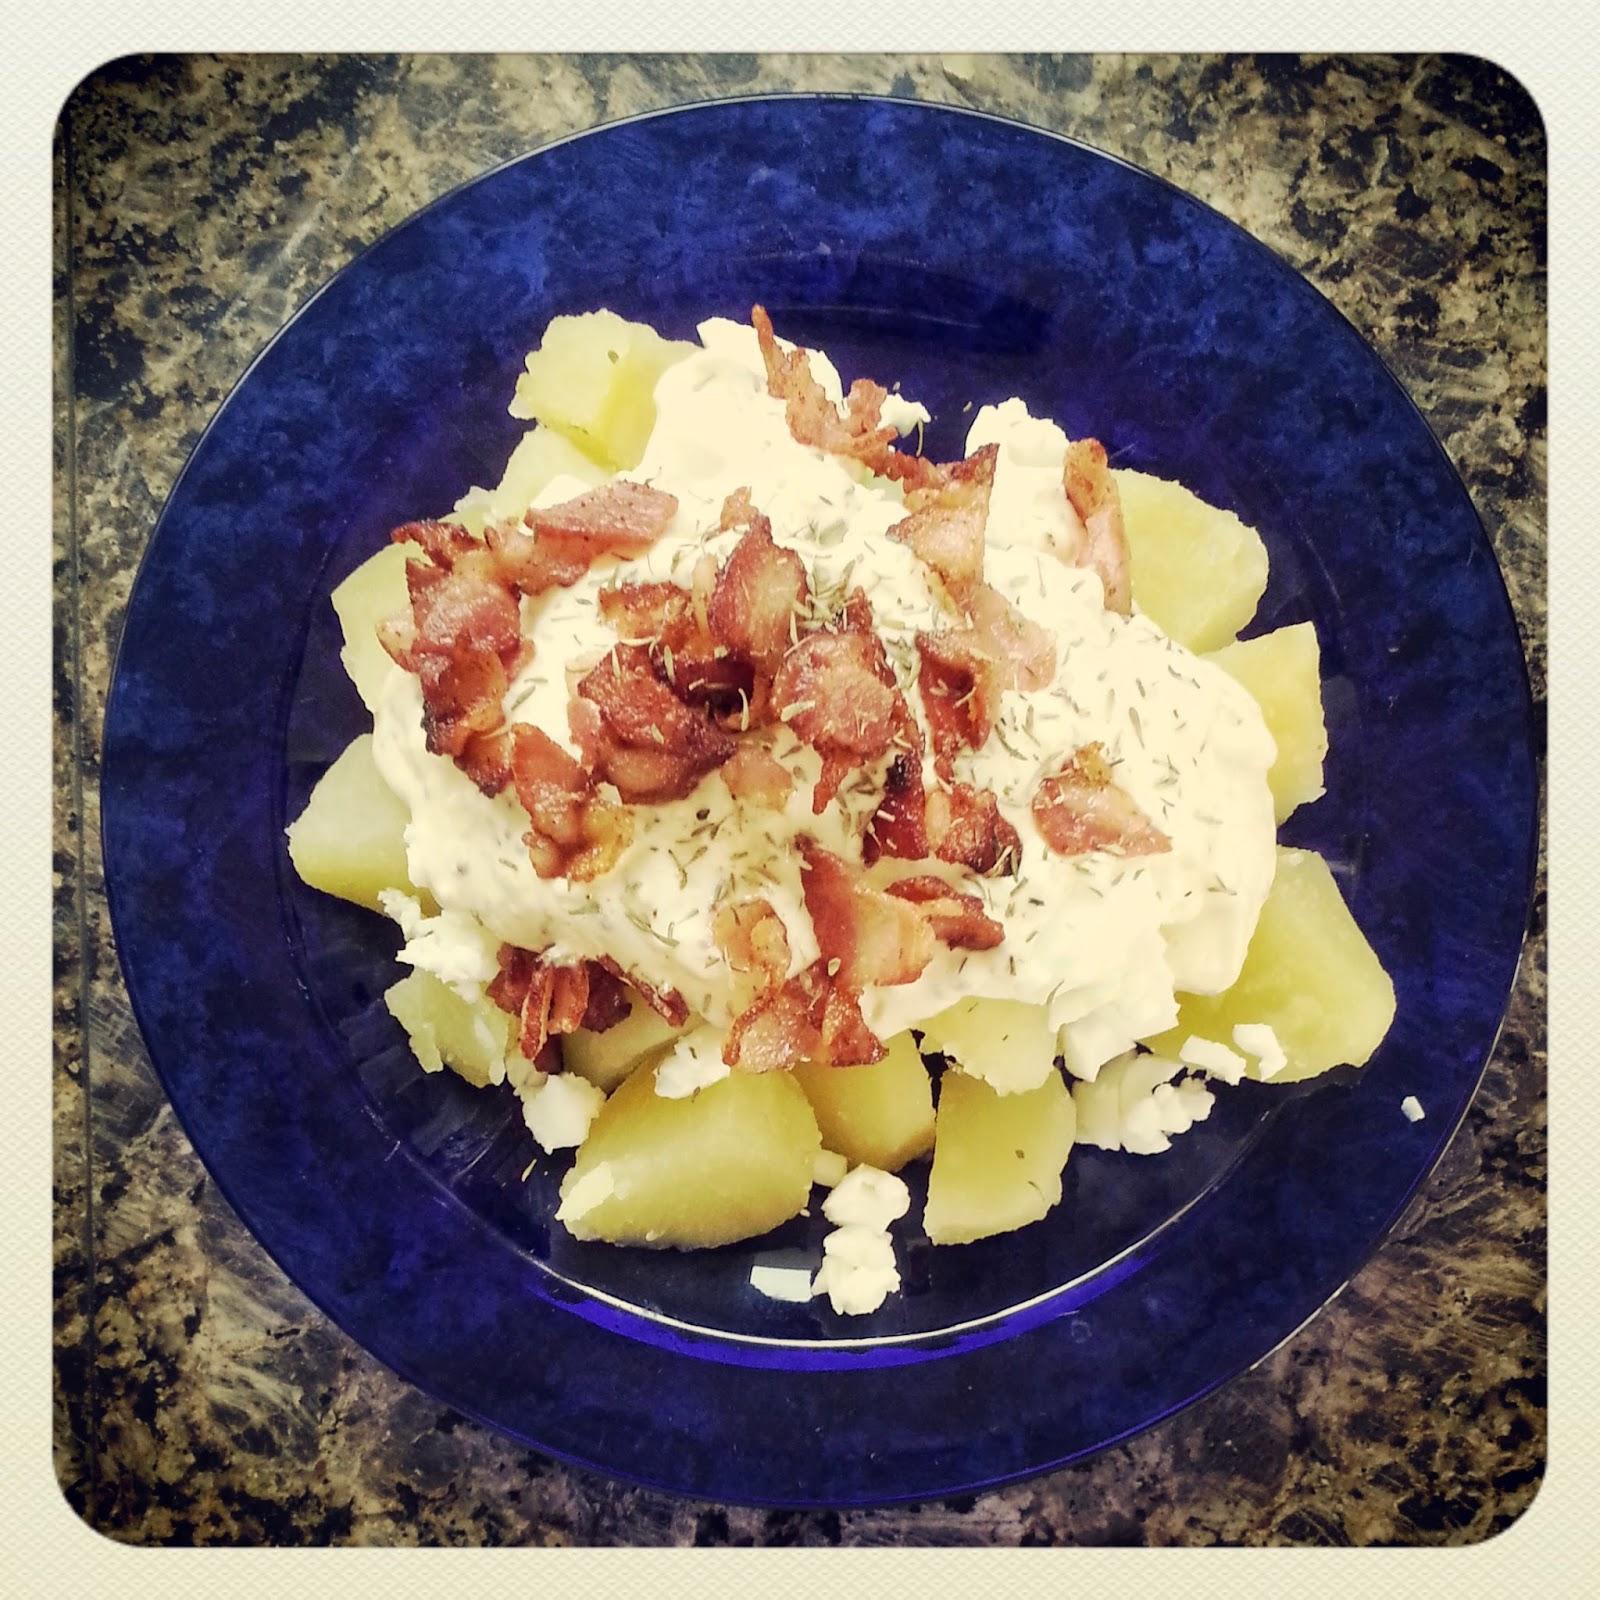 Receta au pair: Ensalada de patata con bacon